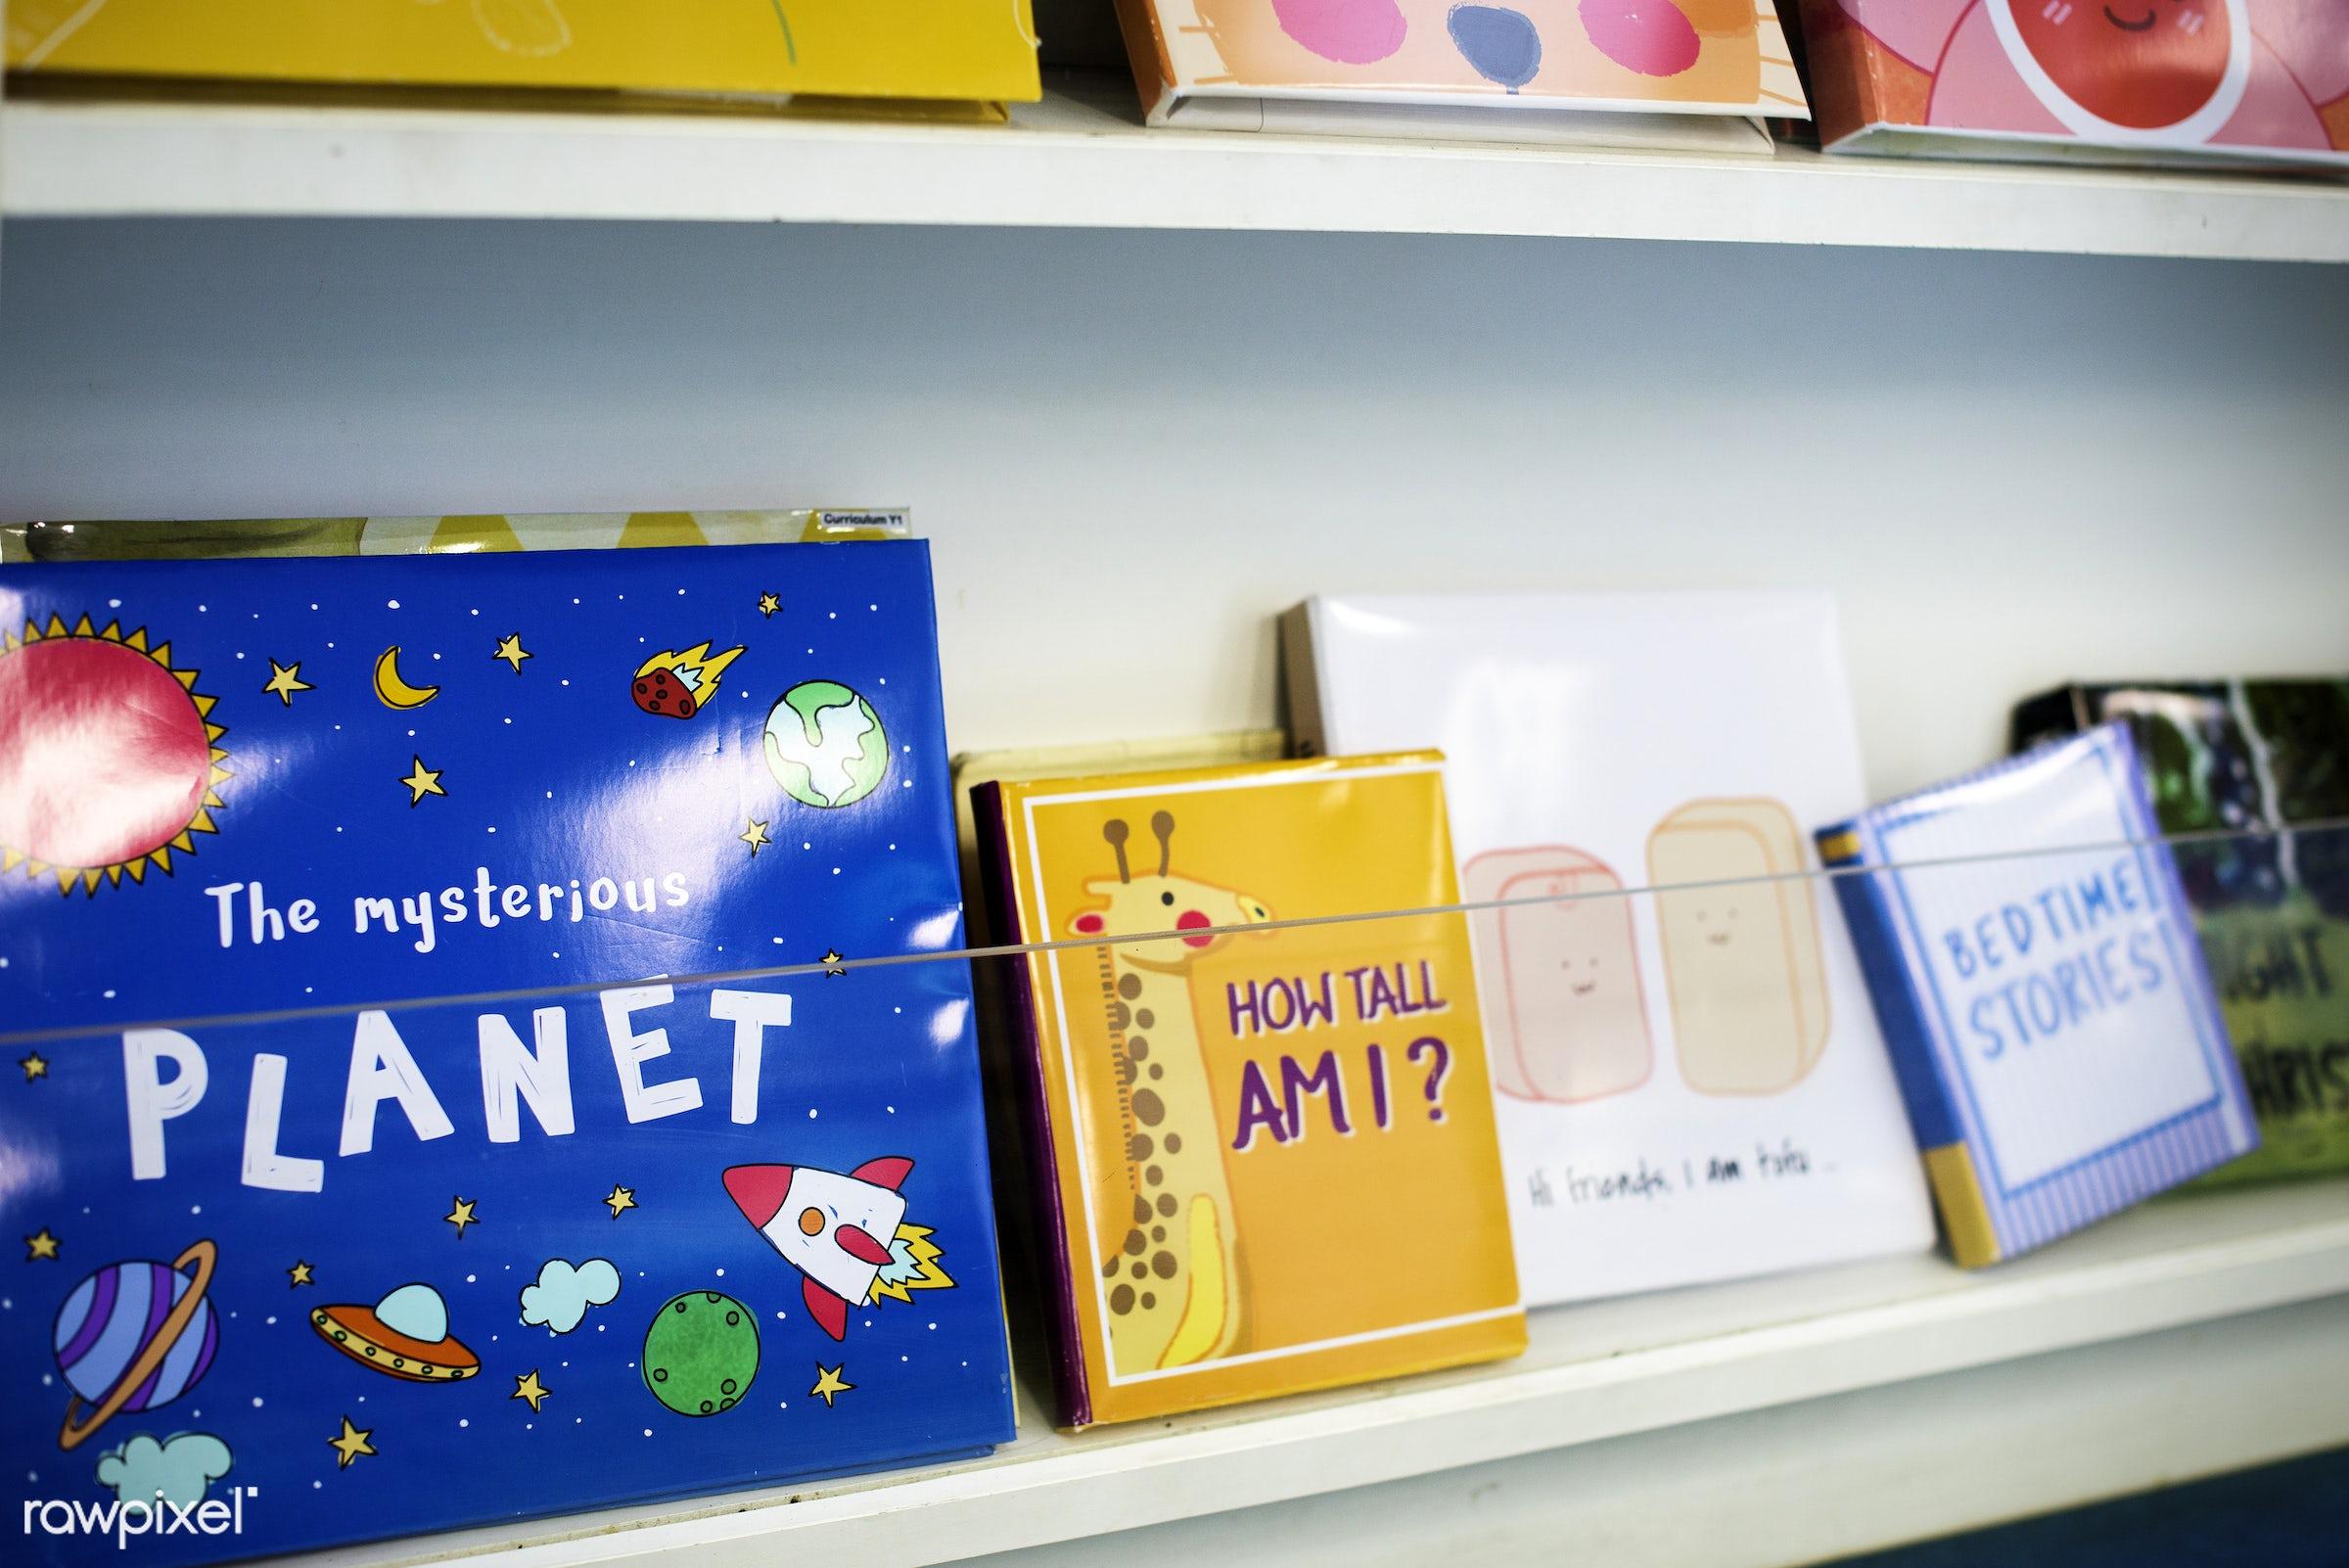 Children's books at elementary school library - nobody, children, entertain, drawing, story, time, pile, shelf, books,...